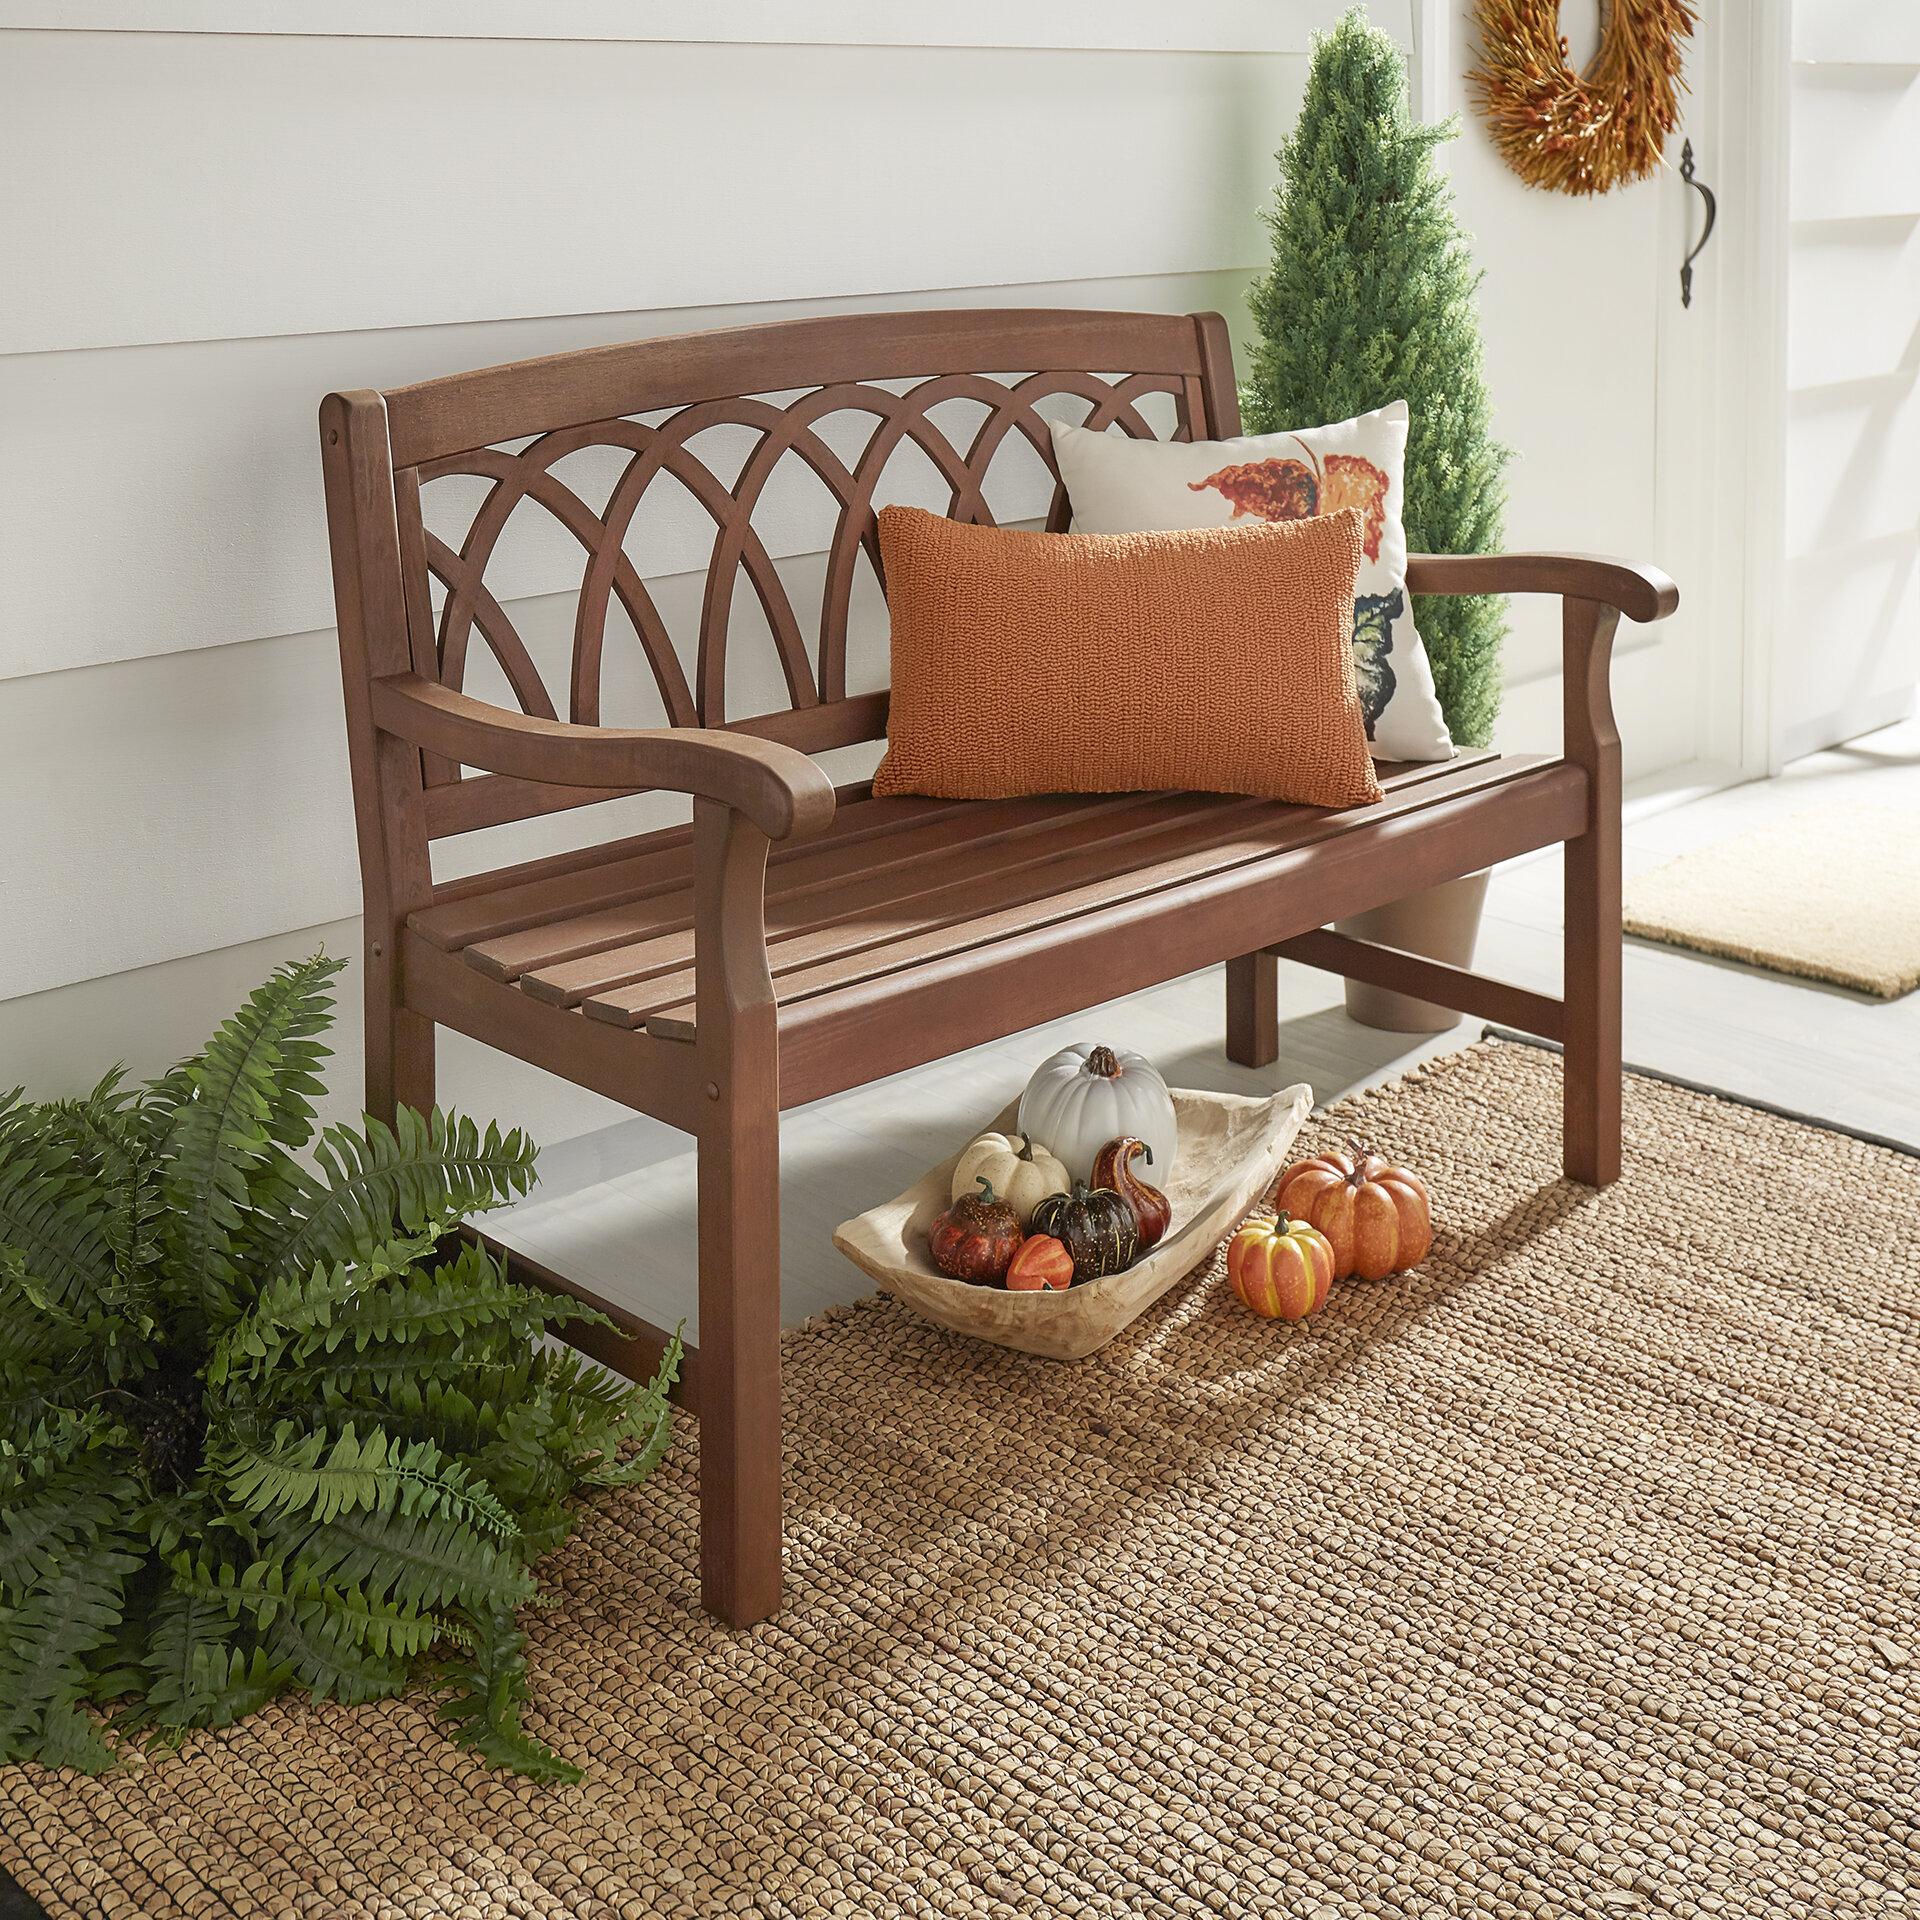 Three Posts Brook Hollow Wooden Garden Bench U0026 Reviews | Wayfair